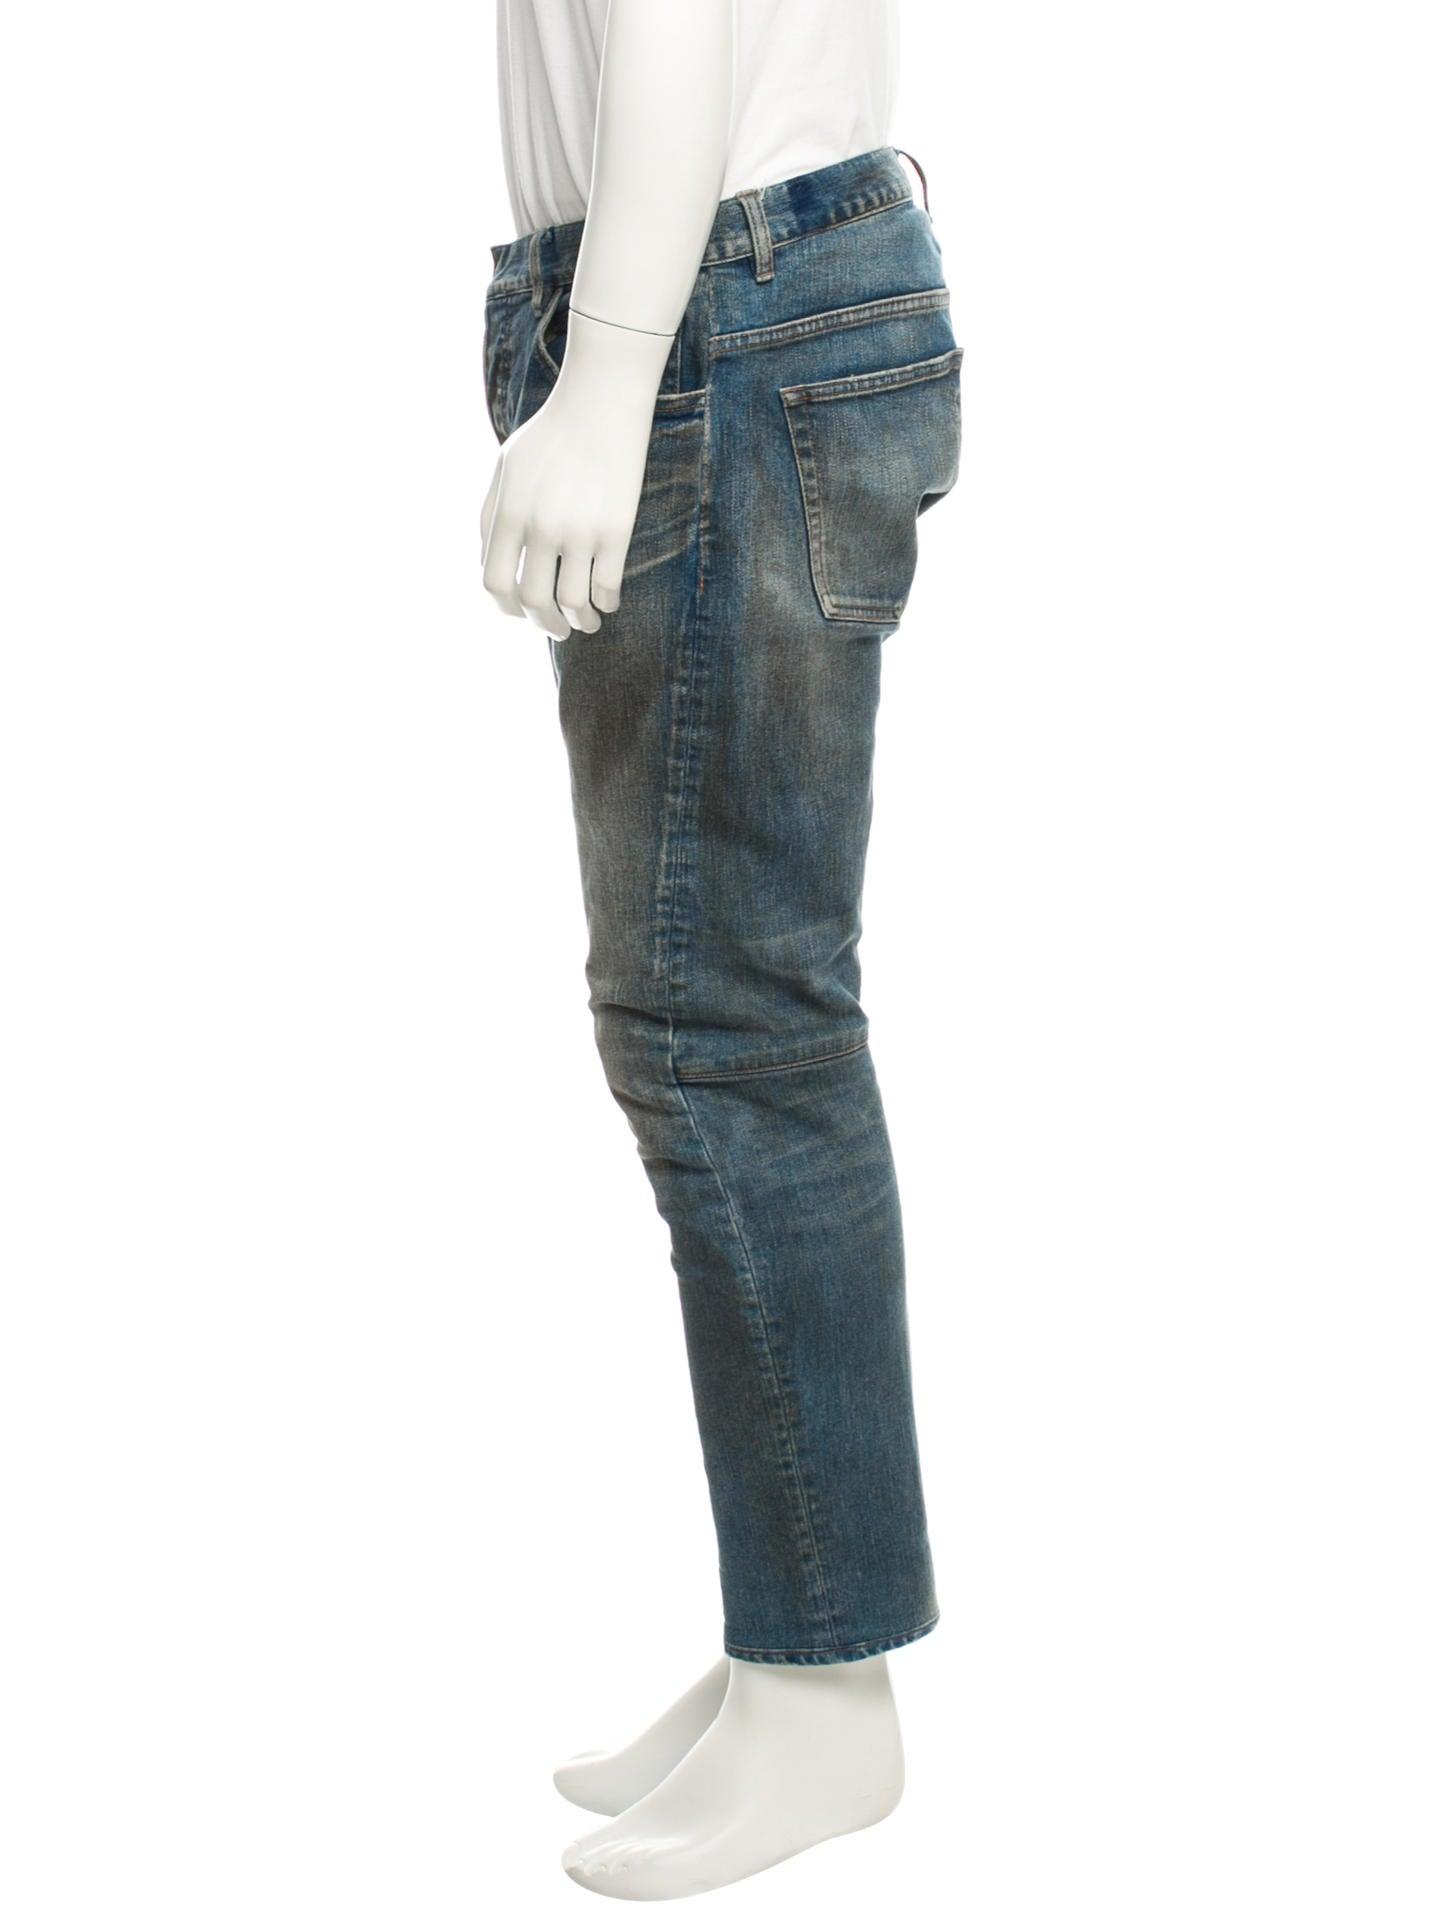 balmain jeans clothing bam20813 the realreal. Black Bedroom Furniture Sets. Home Design Ideas